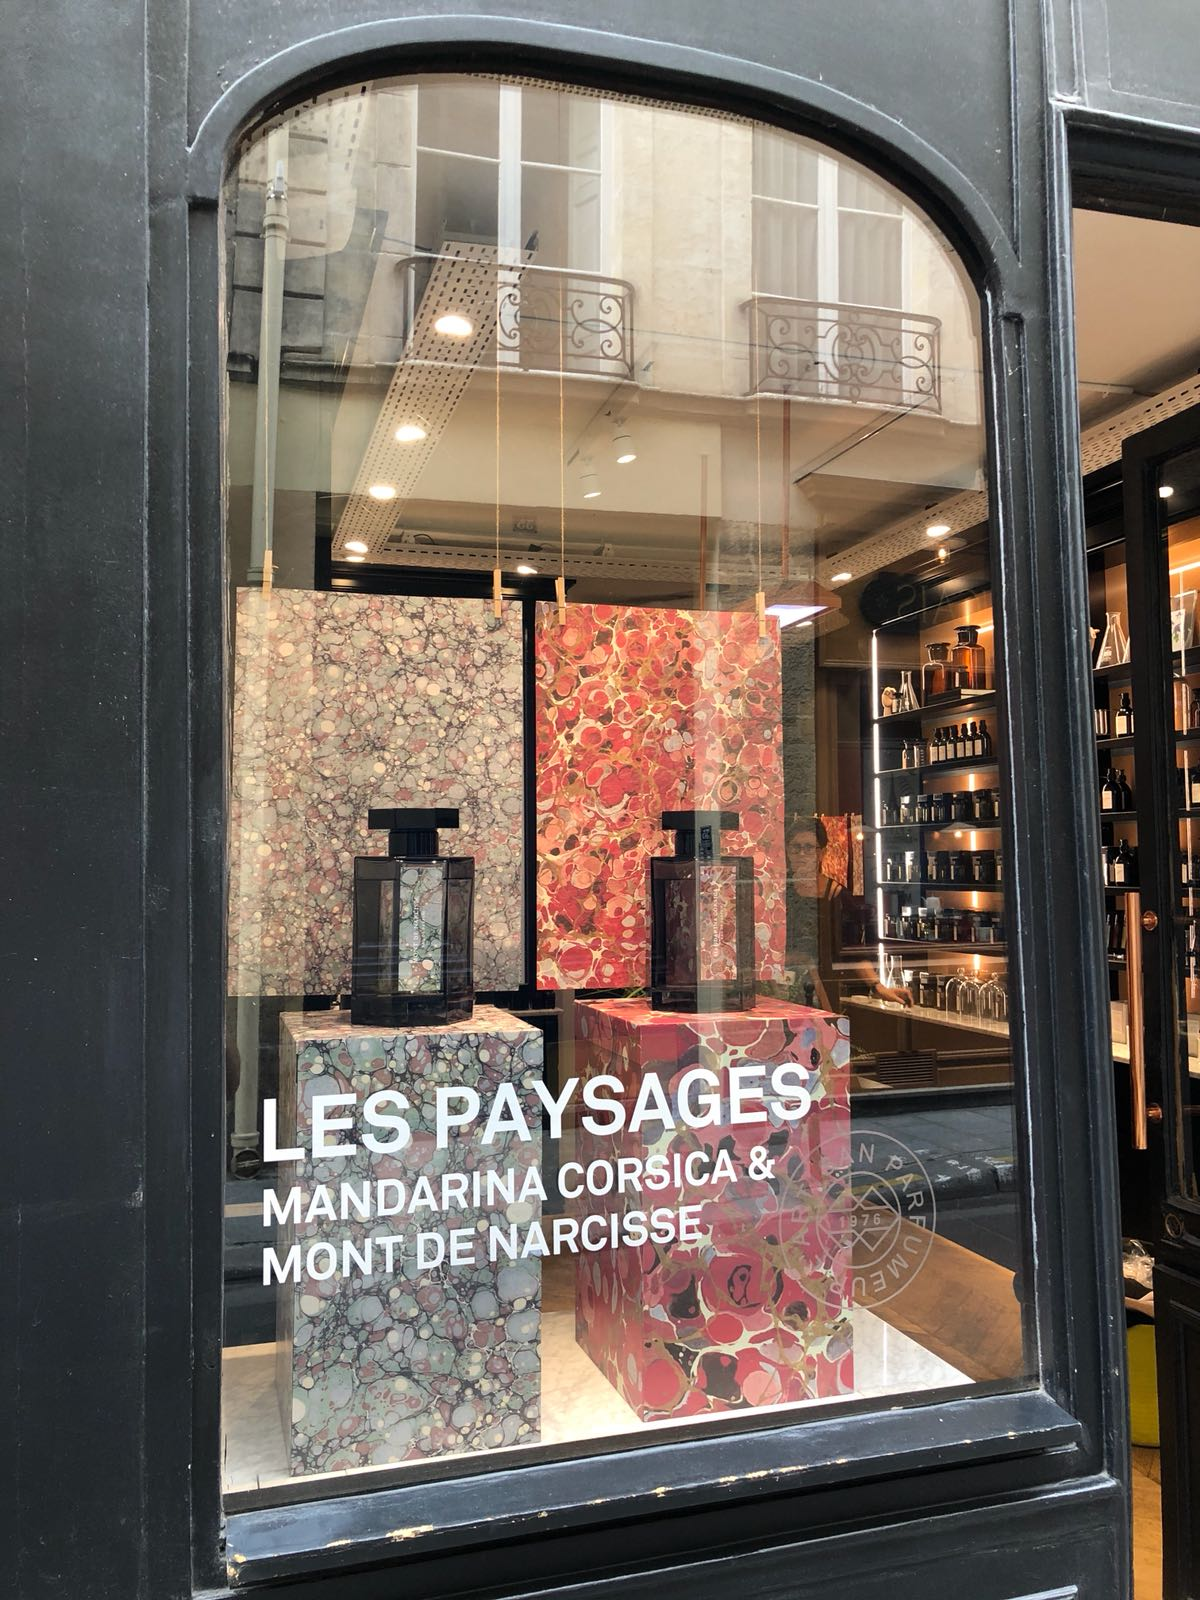 Marais Paysages window display